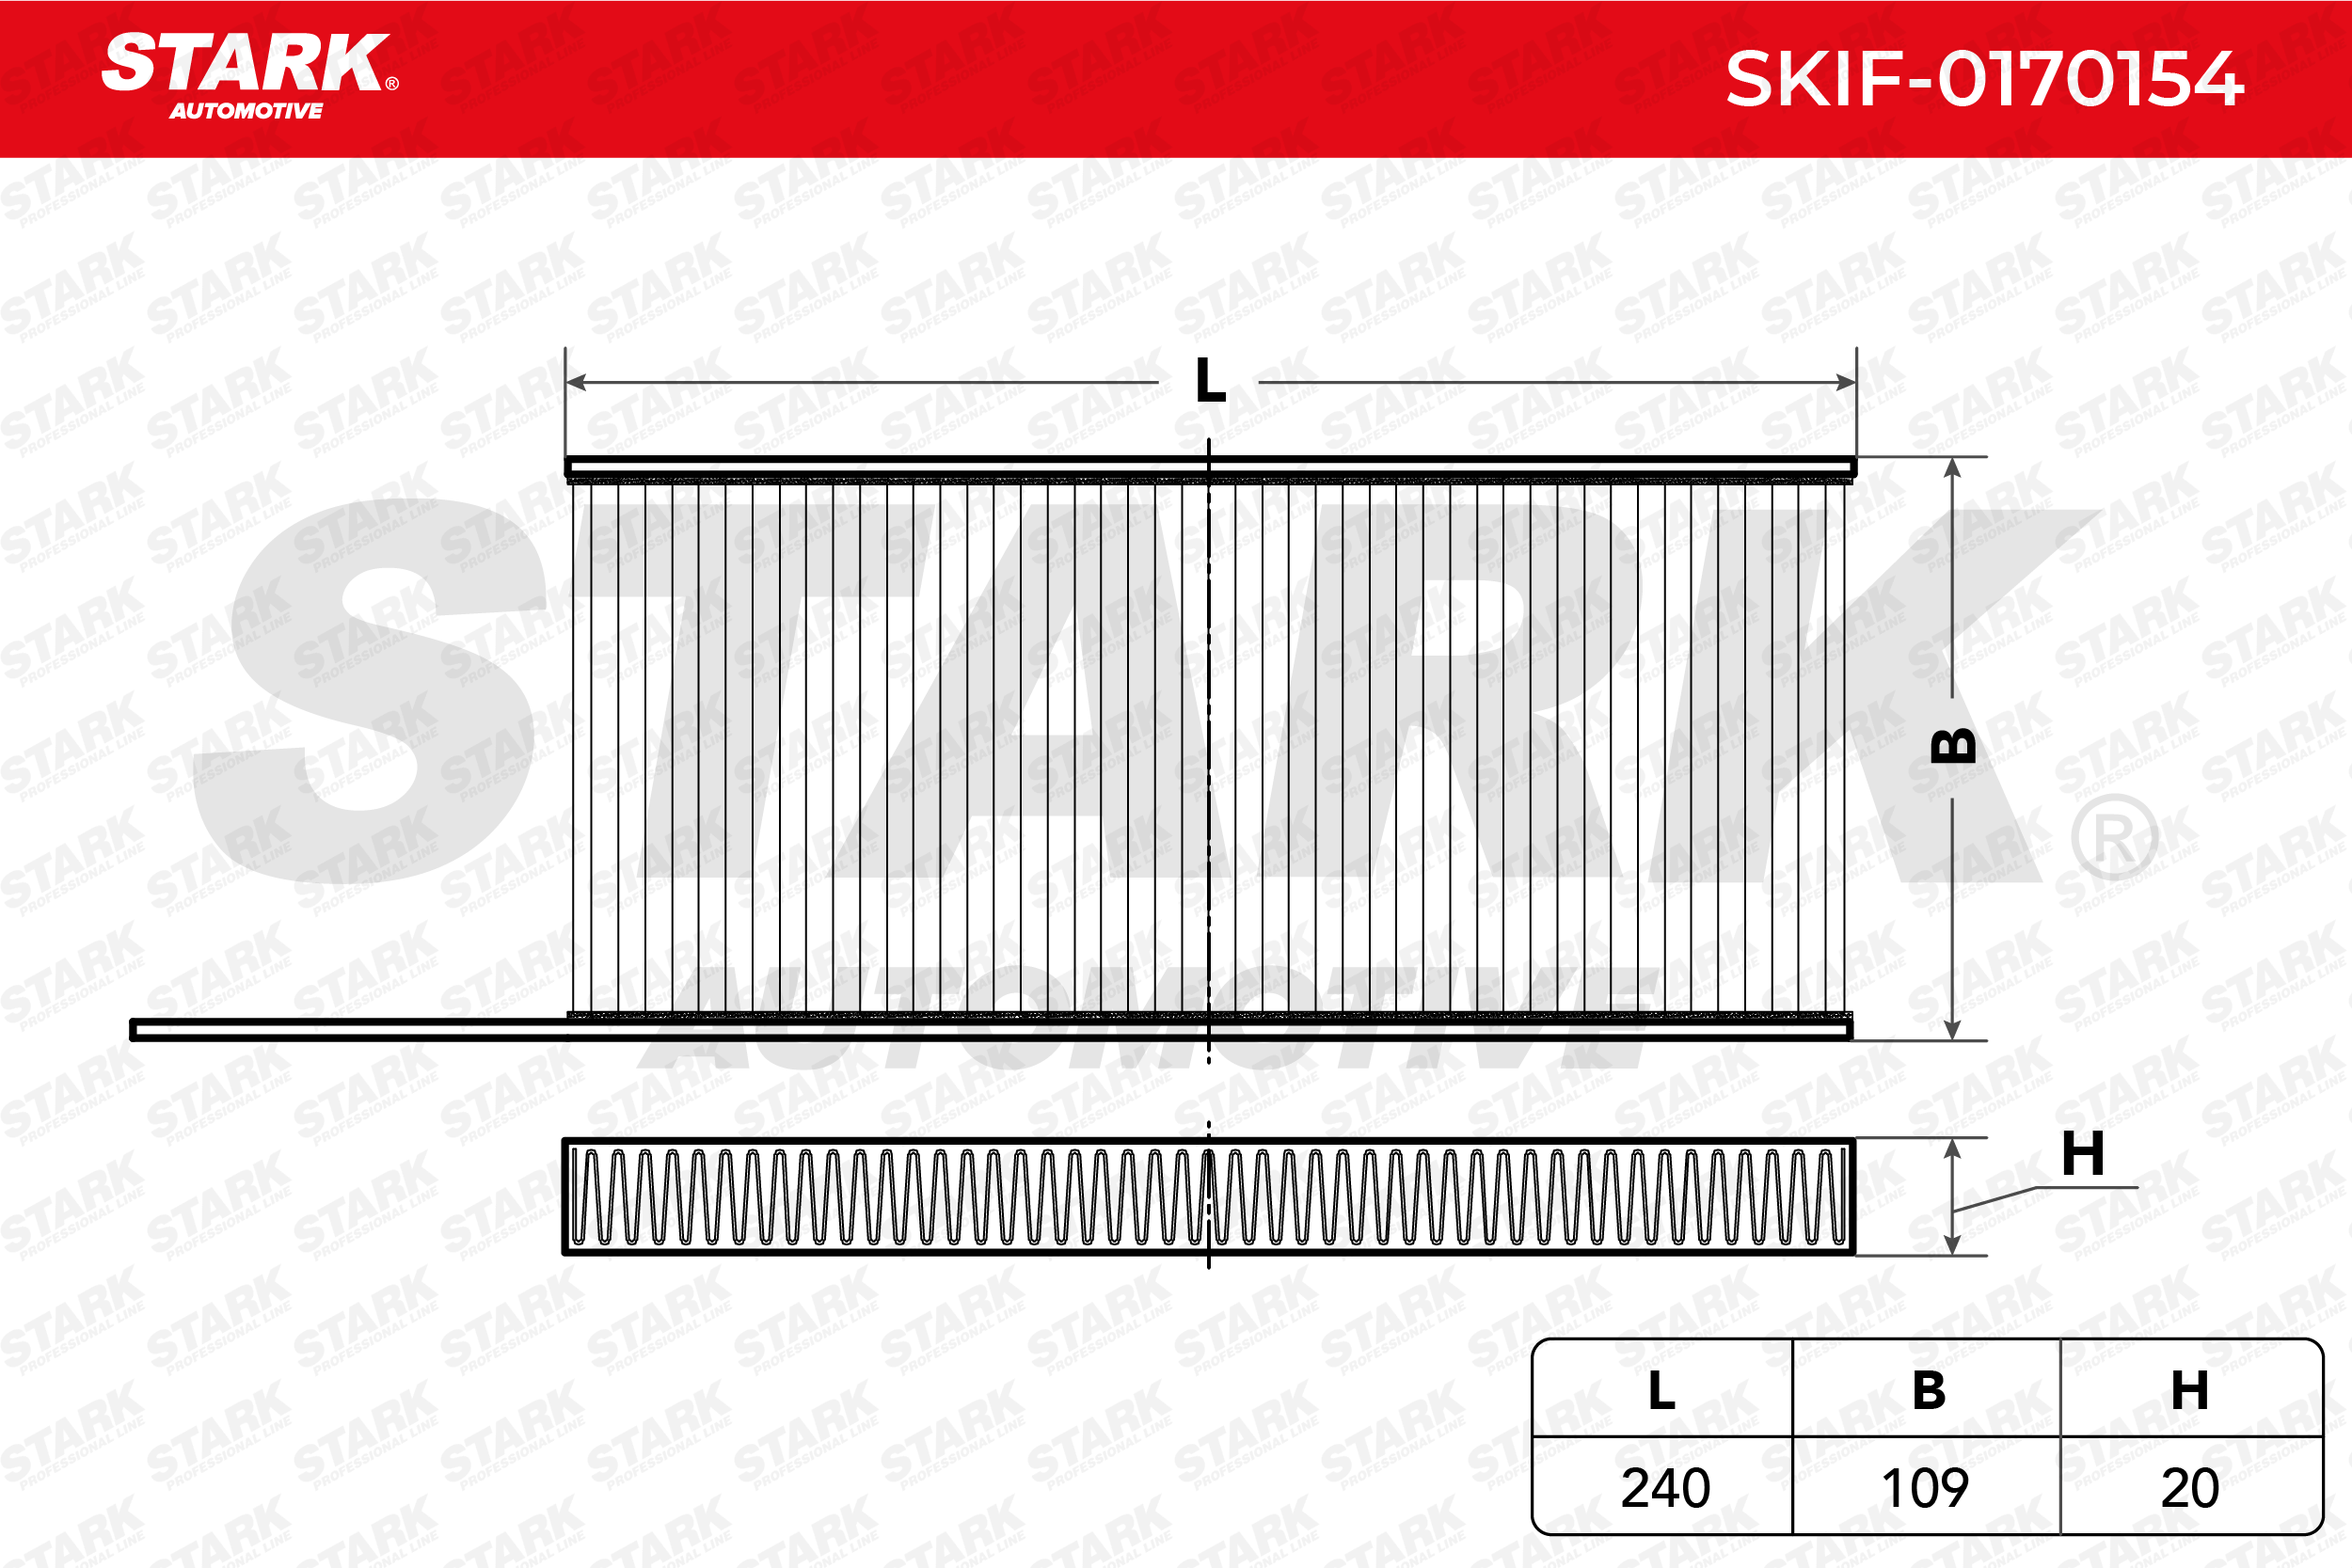 RENAULT KANGOO 2020 Innenraumluftfilter - Original STARK SKIF-0170154 Breite: 109mm, Höhe: 20mm, Länge: 240mm